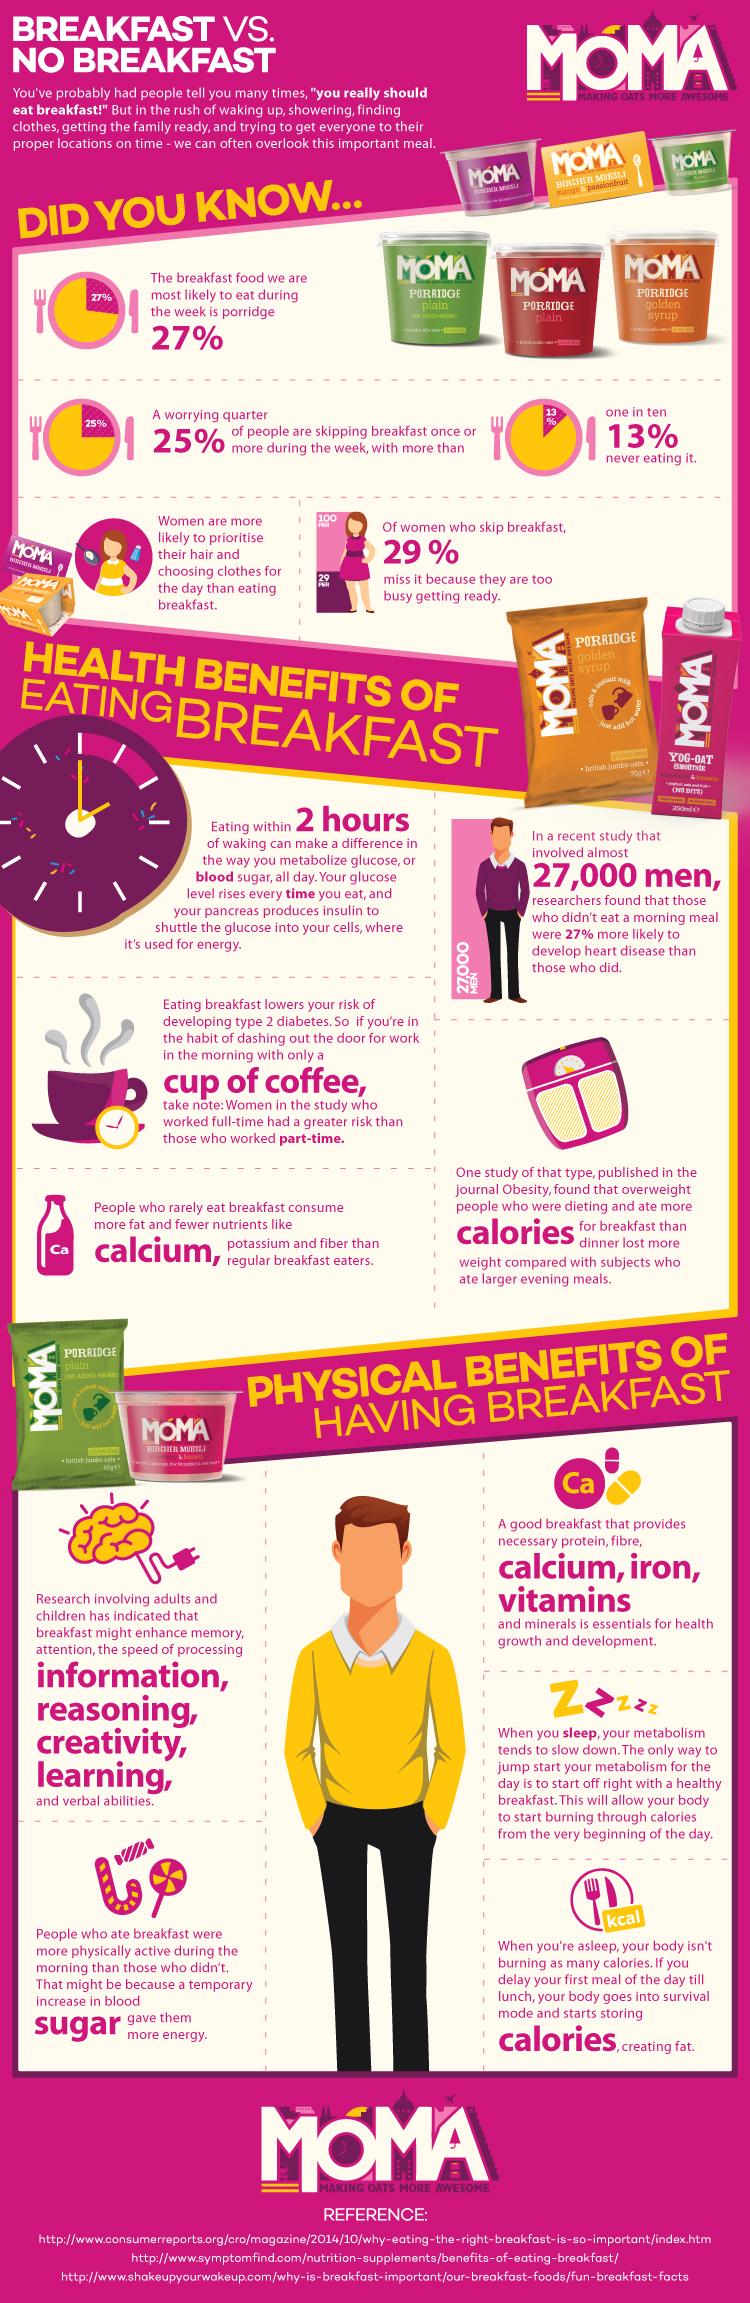 Breakfast-vs.-No-Breakfast - The health benefits of eating breakfast